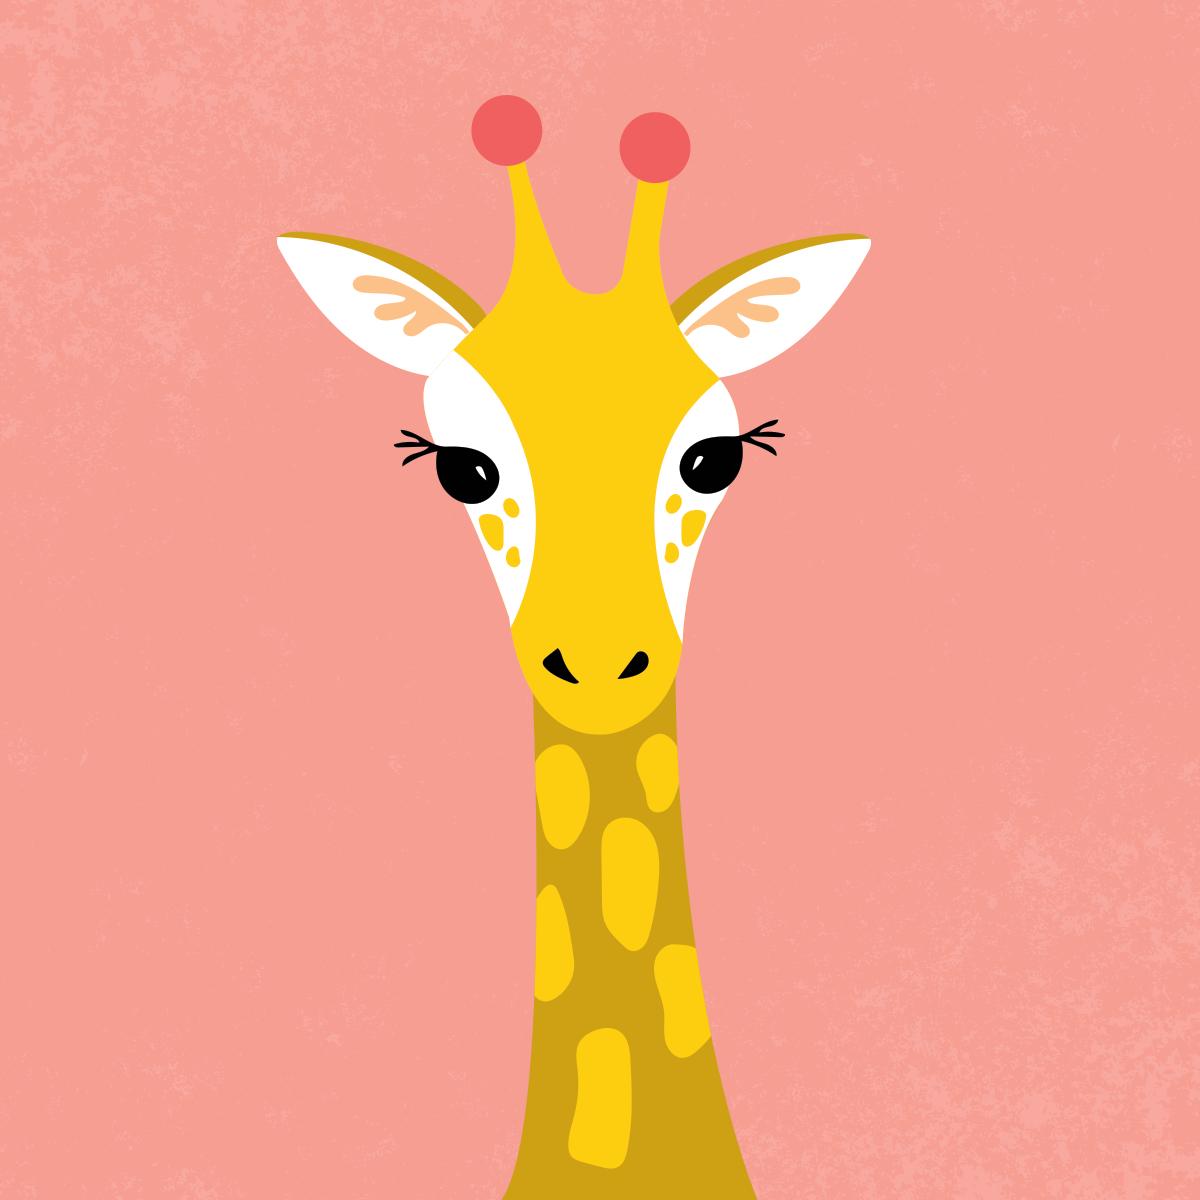 Giraffe illustration by Pace Creative Design Studio